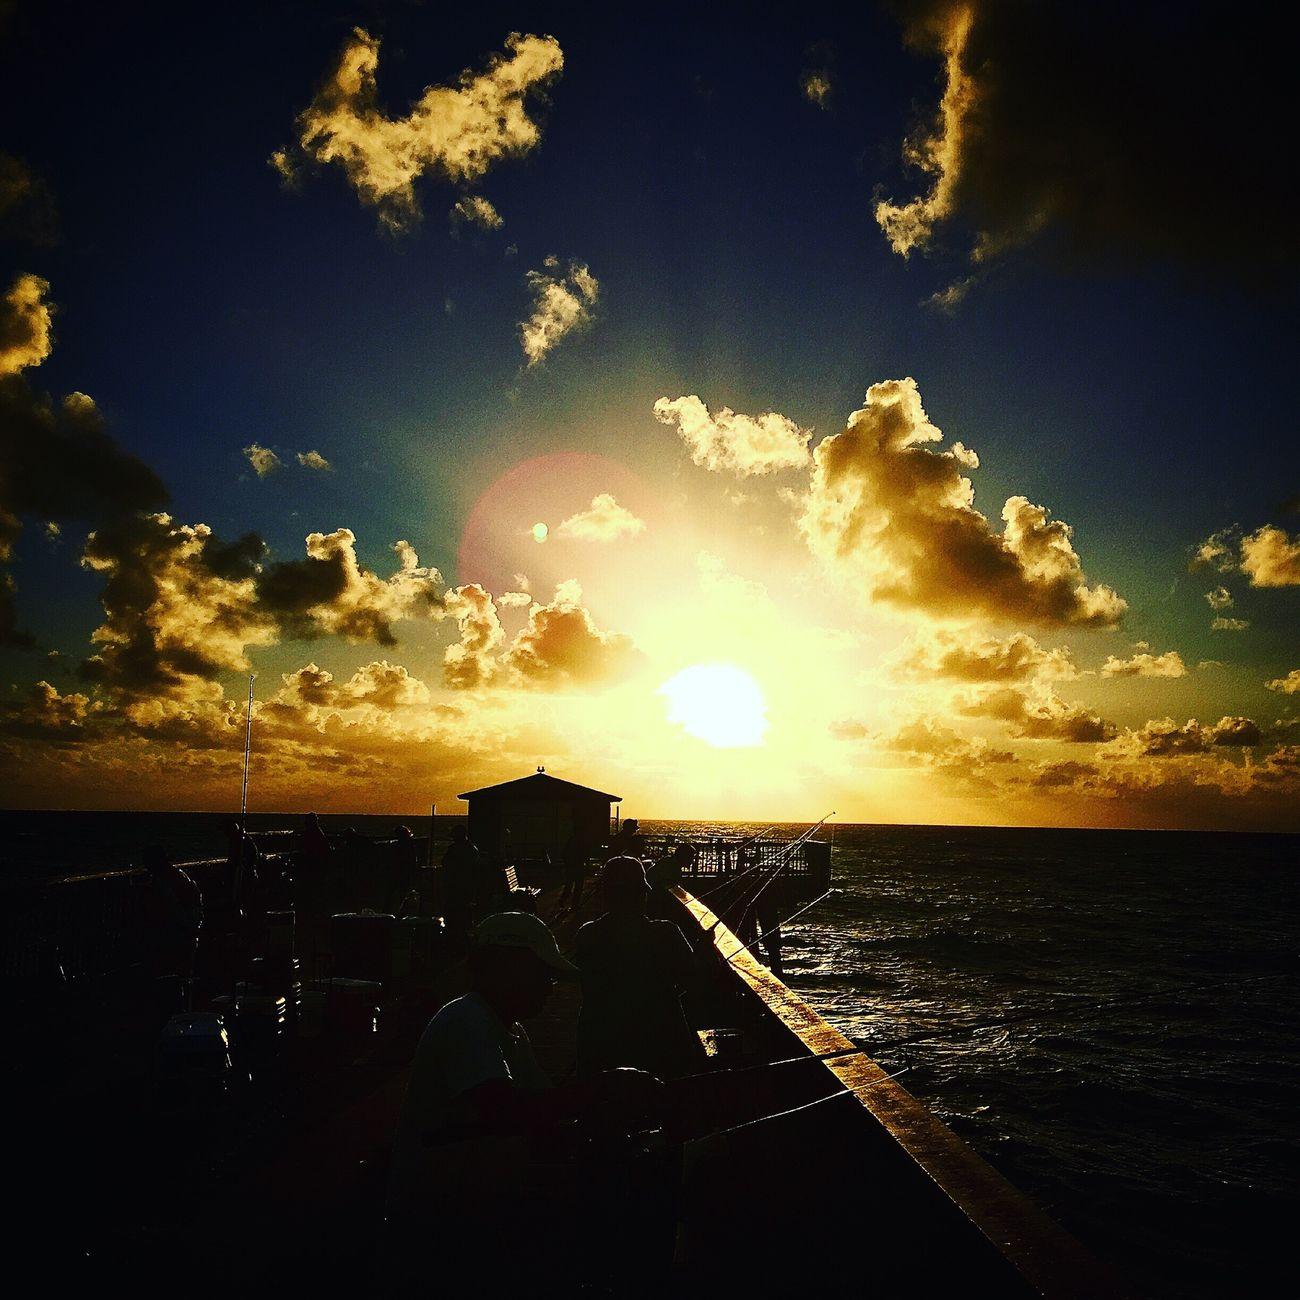 Bright Lights Sunrise Enjoying The Sun Yaaayy🙌 Sunshine Fisherman Sunrise And Clouds